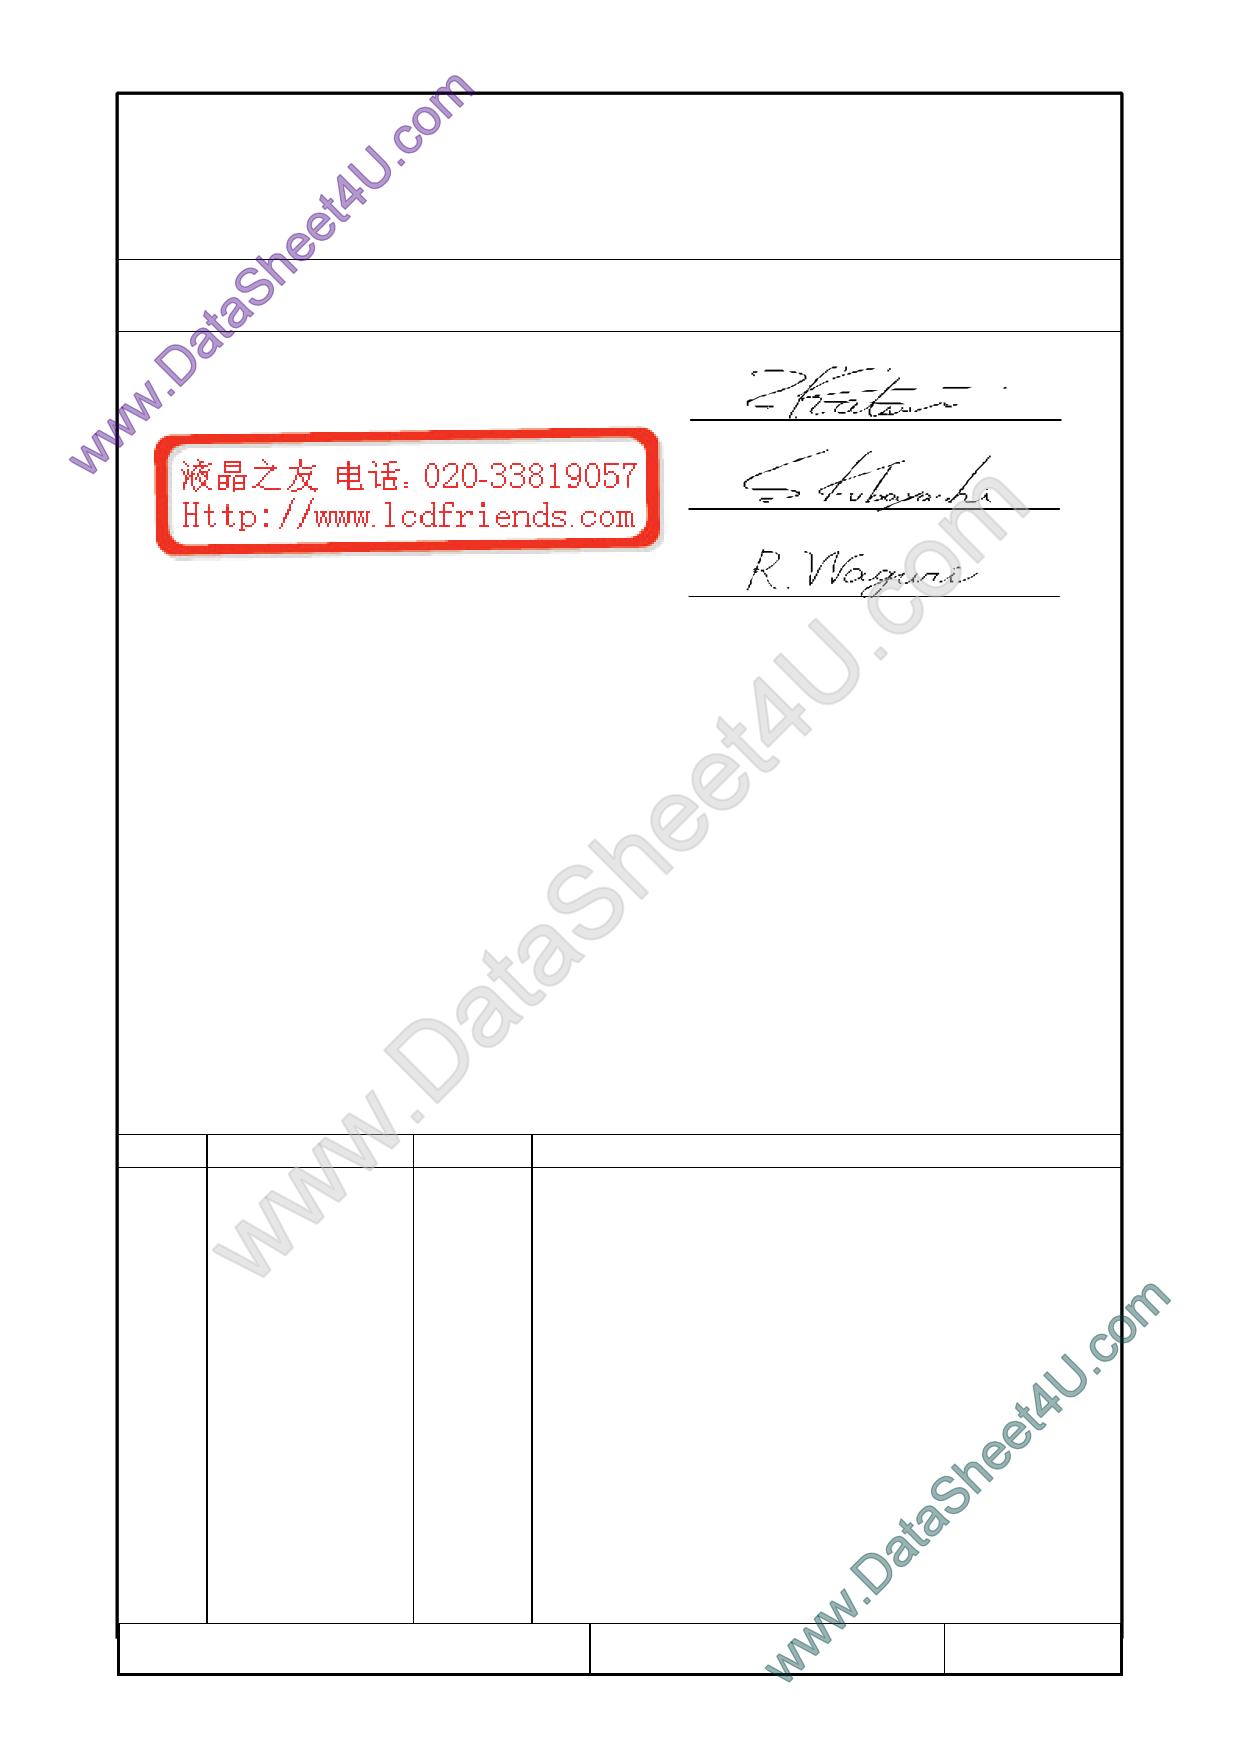 F-51477GNFJ-SFW-AB Даташит, Описание, Даташиты